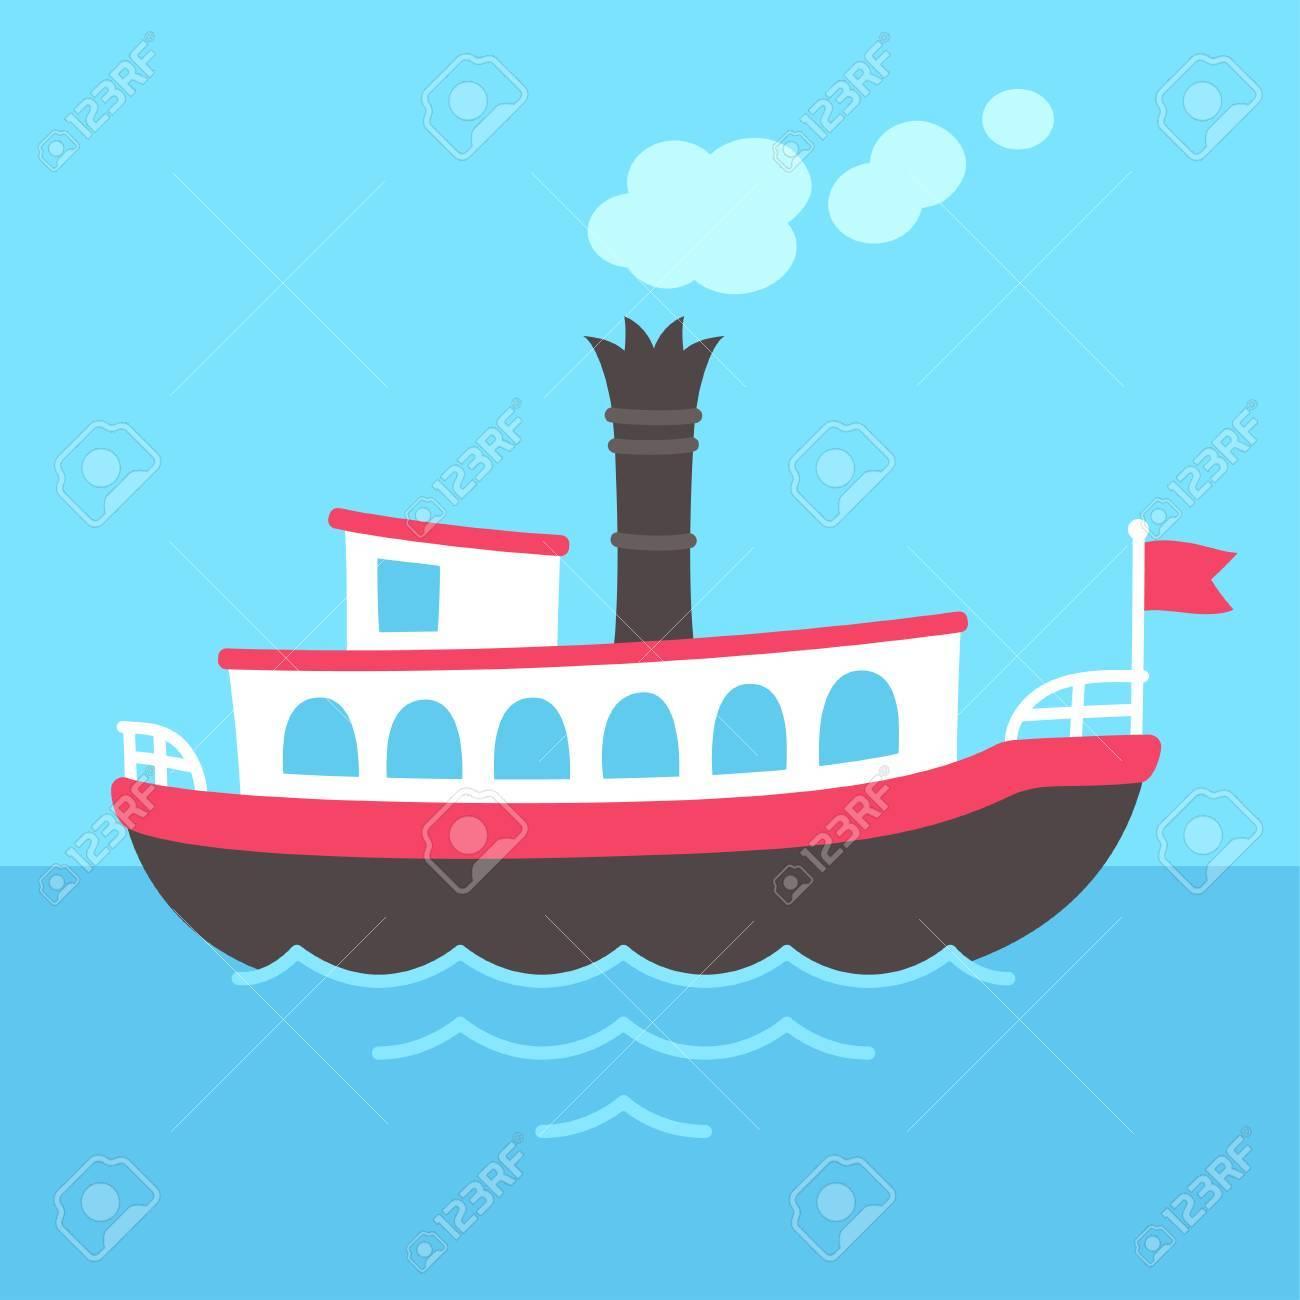 1300x1300 Cute Cartoon Retro Riverboat Drawing. Classic American Passenger